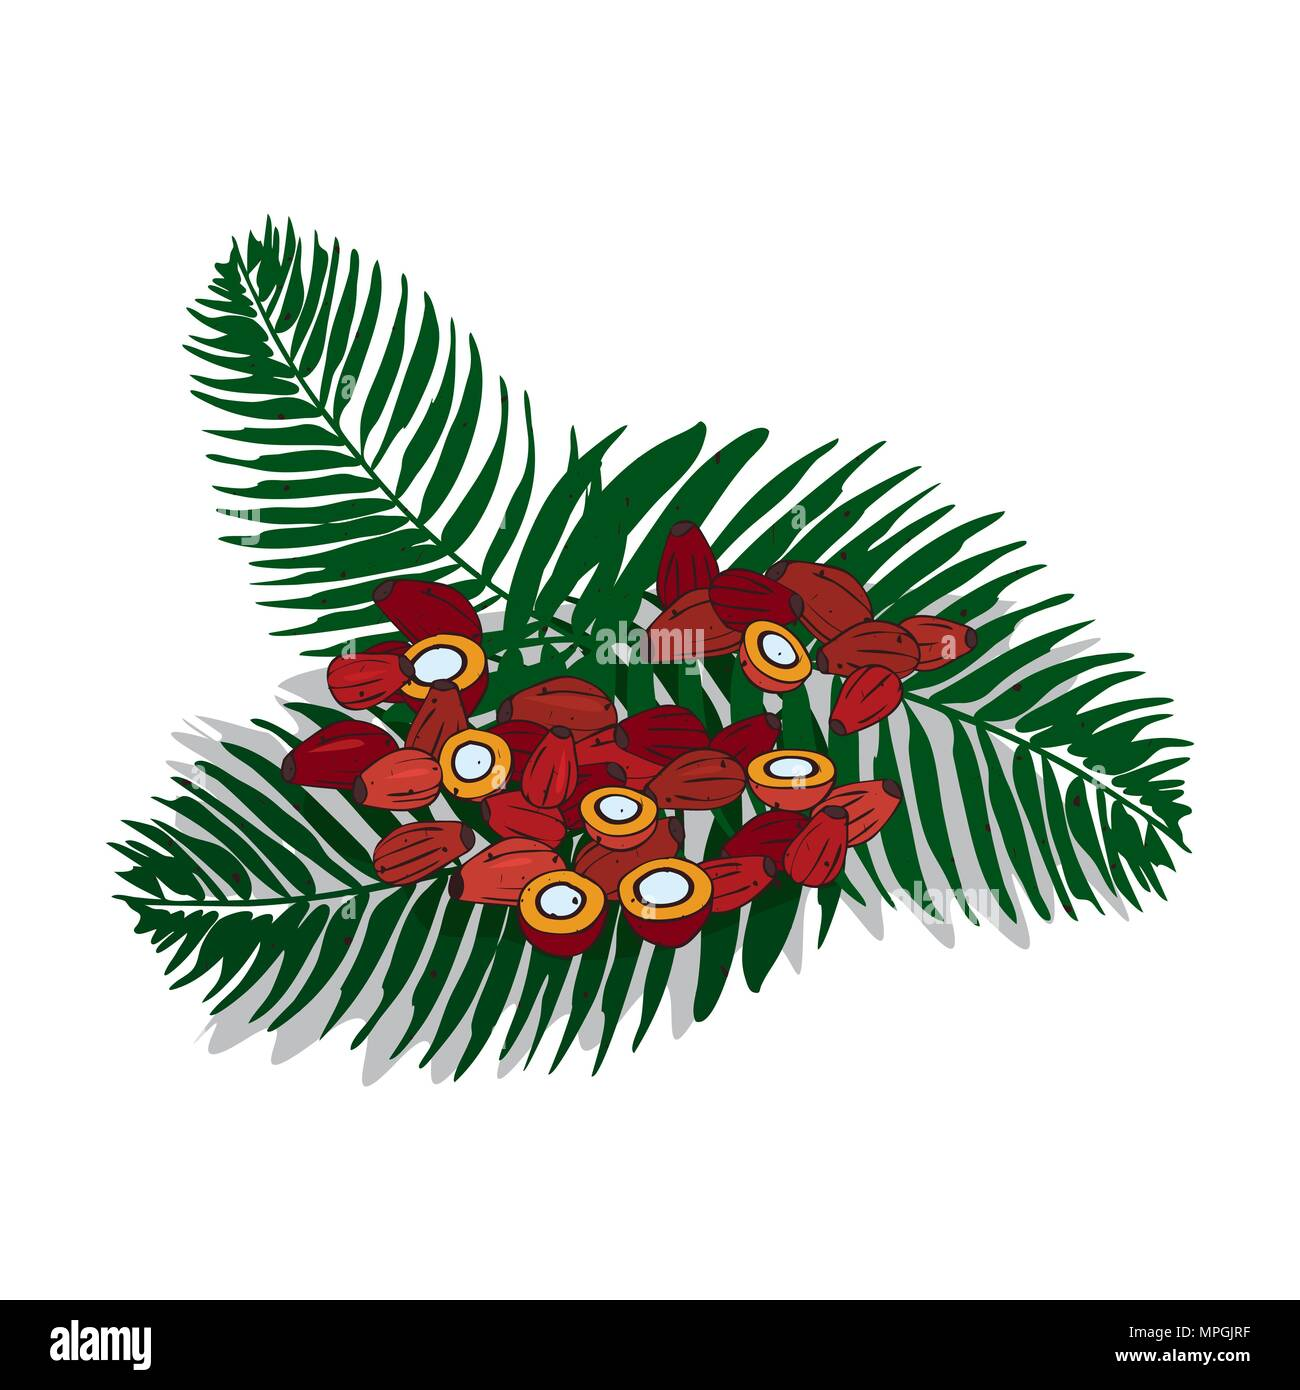 Clip Art Date Fruit Images - Date Fruit Clipart, HD Png Download ,  Transparent Png Image - PNGitem